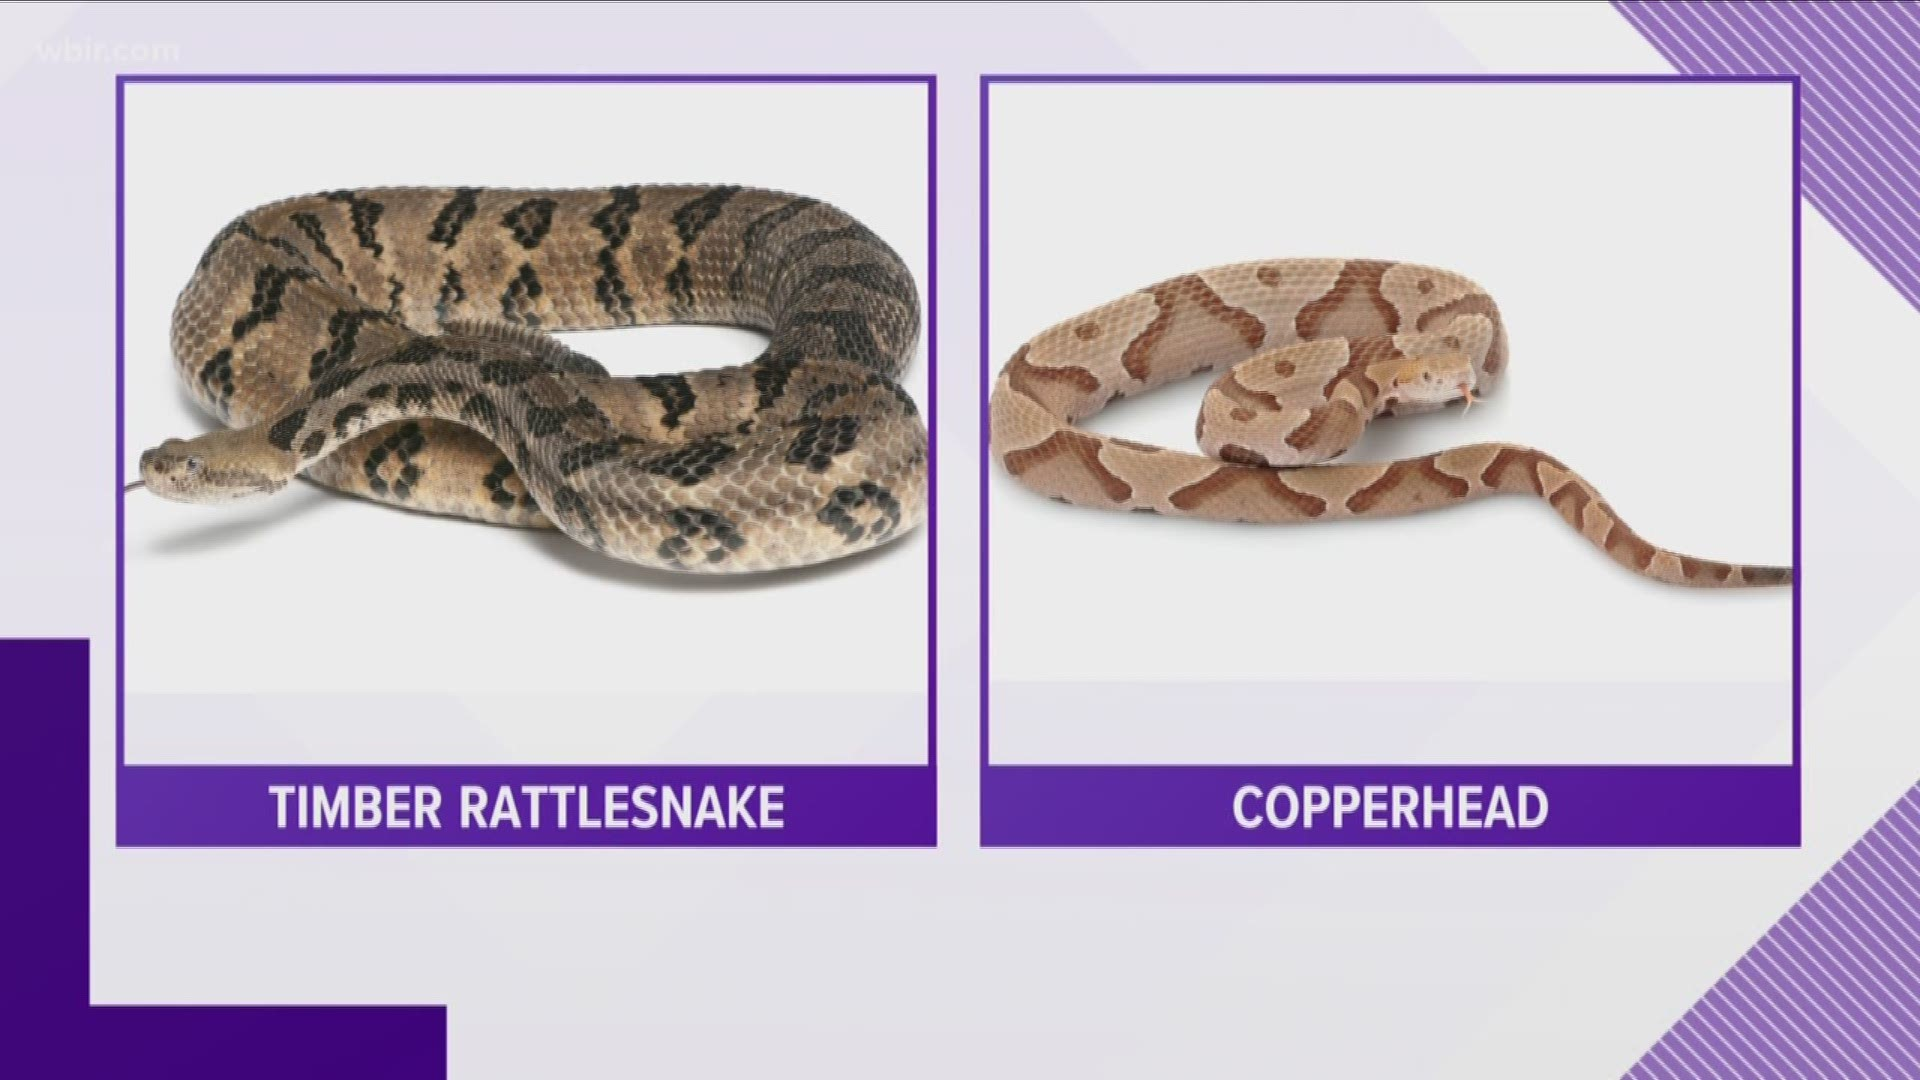 How To Tell If A Snake Is Venomous Wbir Com